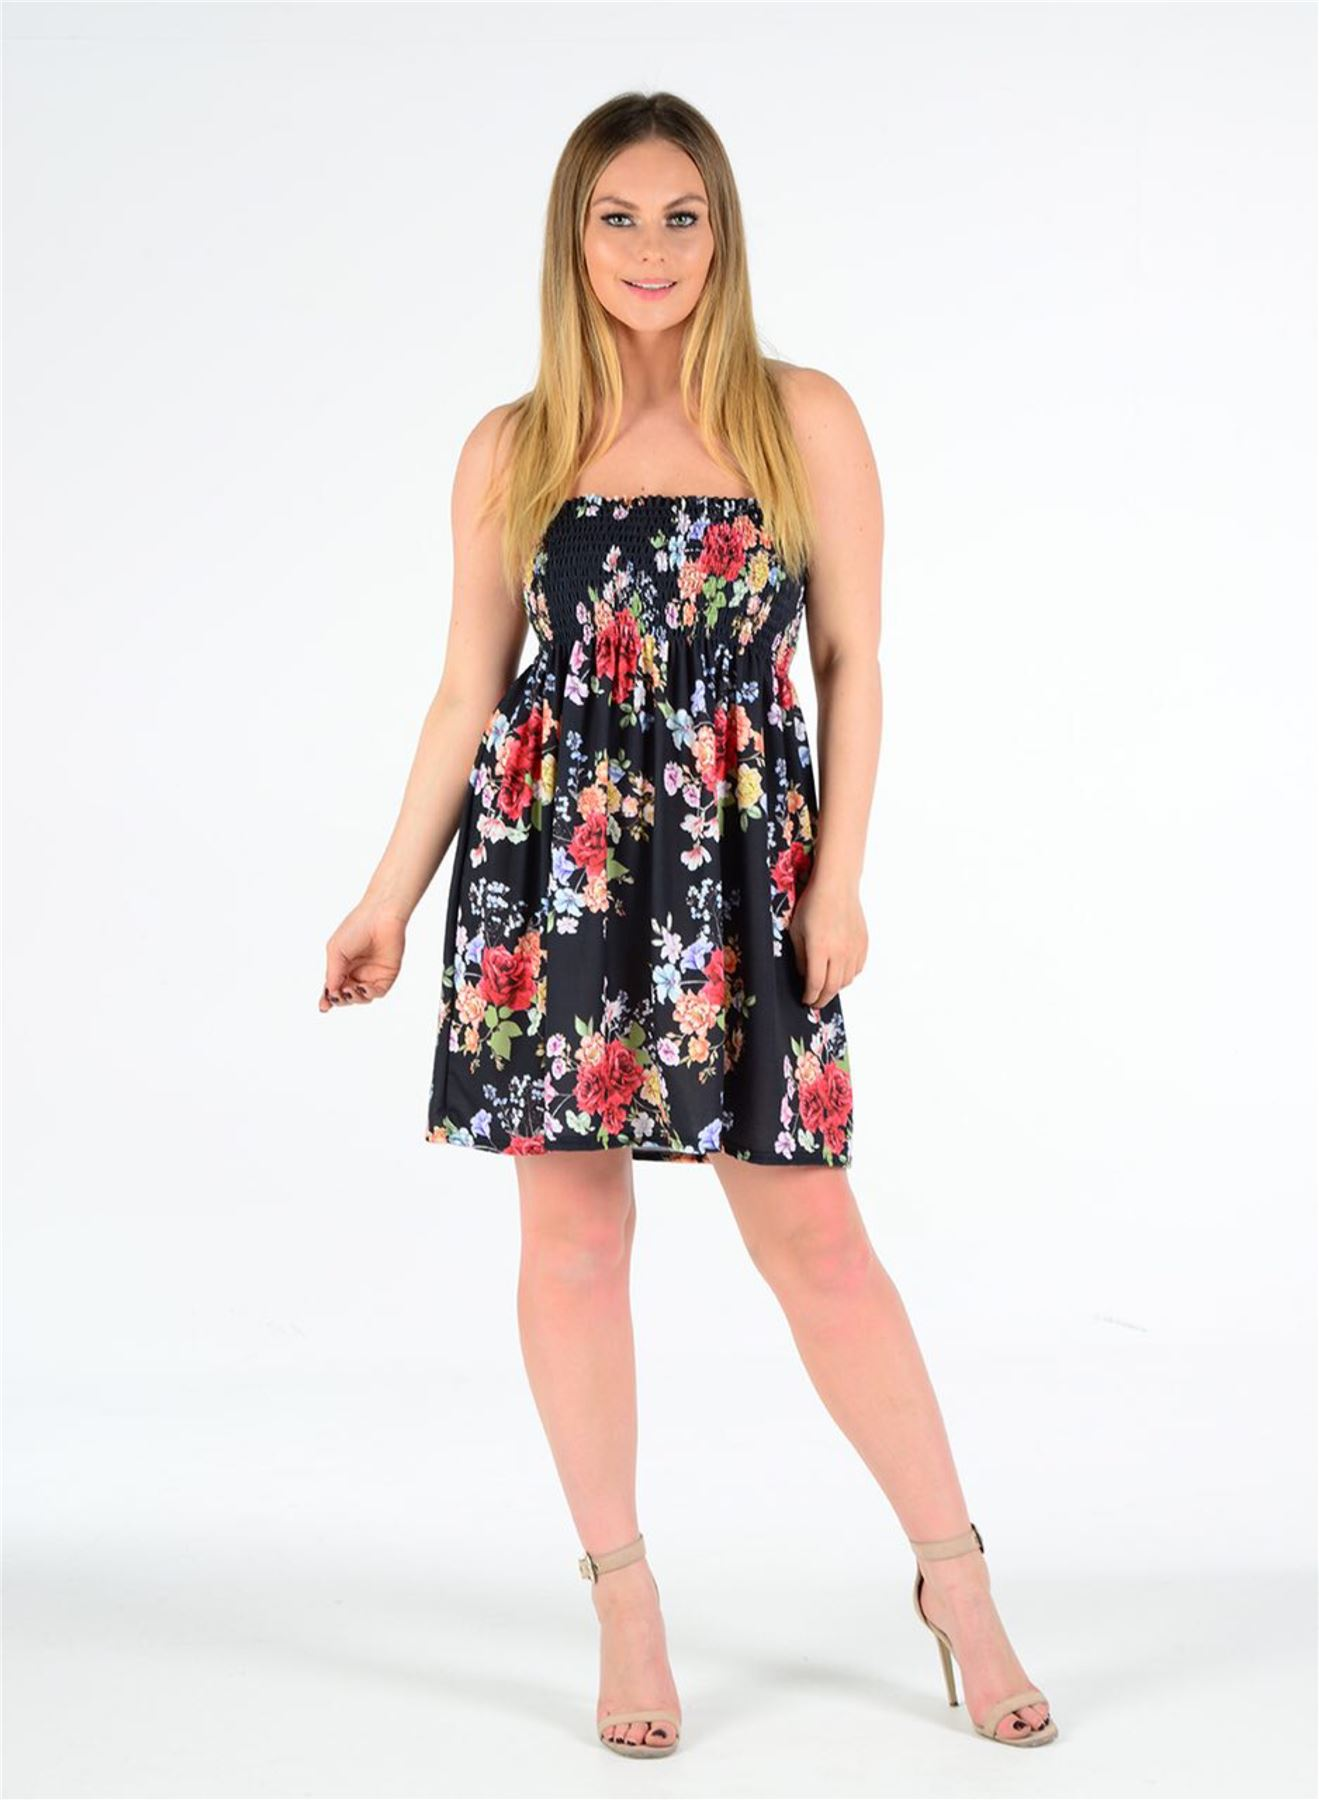 2cbdafdf03 Womens Floral Print Sheering Boobtube Bandeau Strapless Summer Mini ...